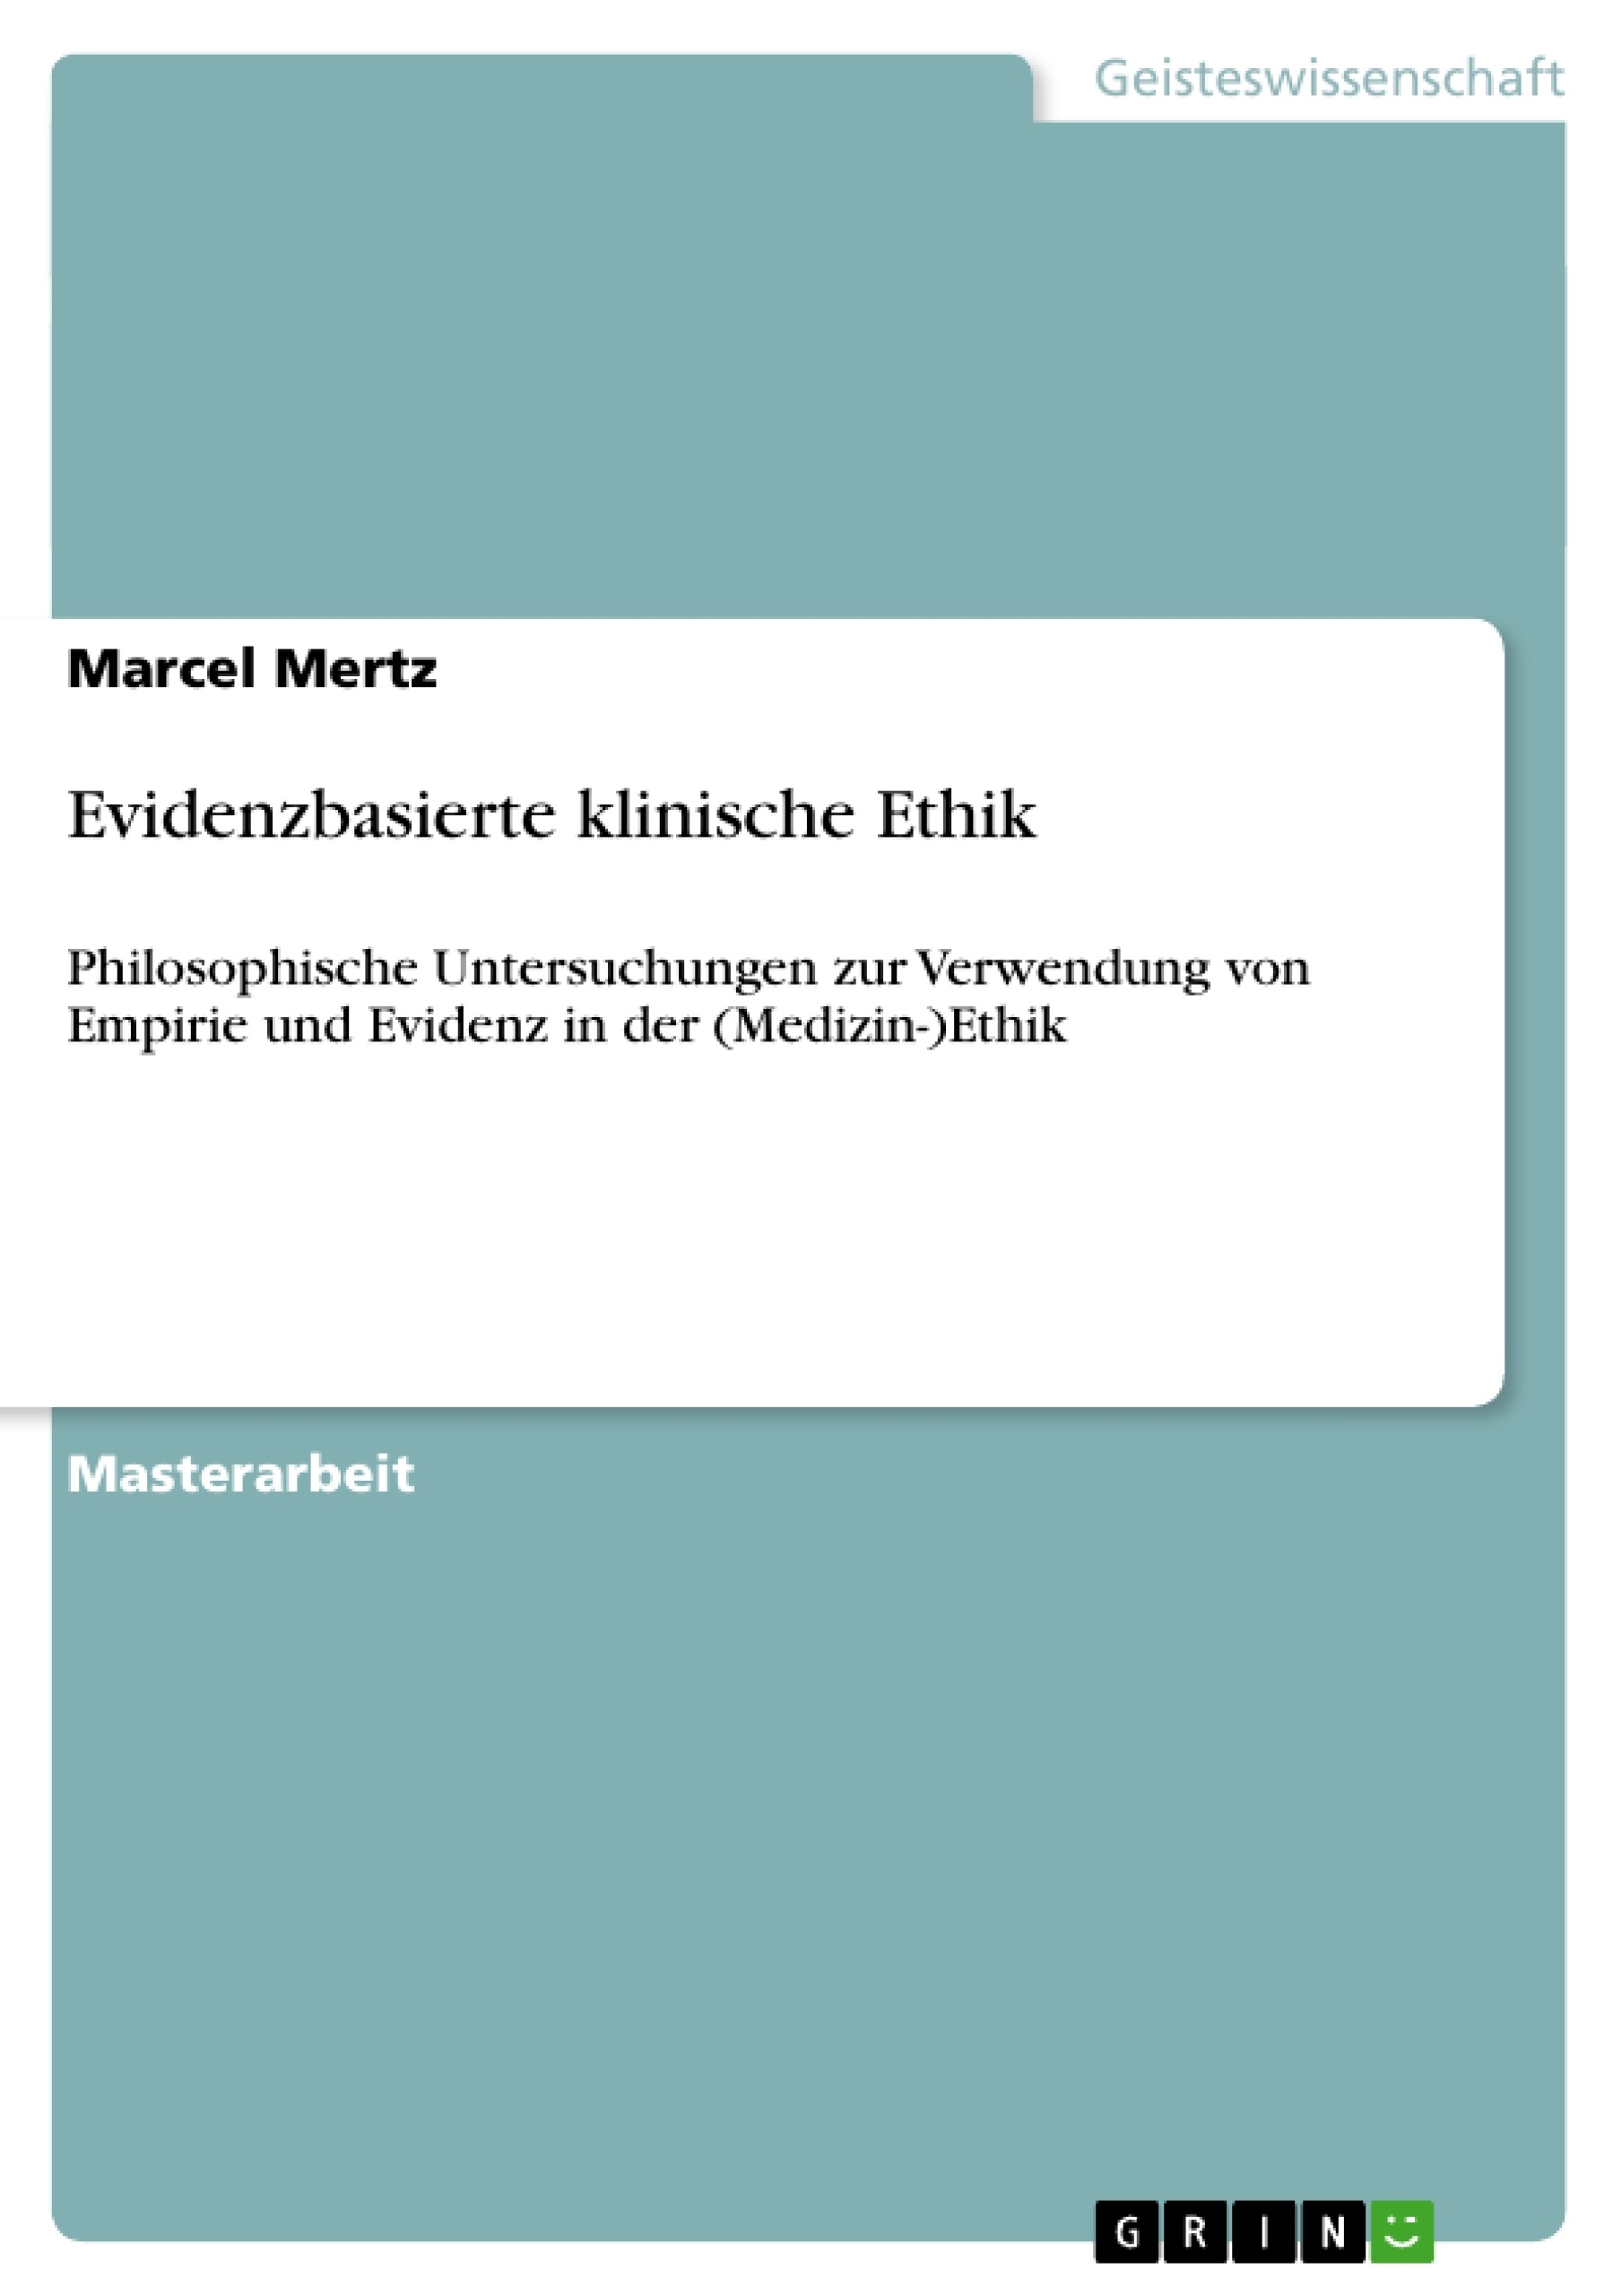 Titel: Evidenzbasierte klinische Ethik